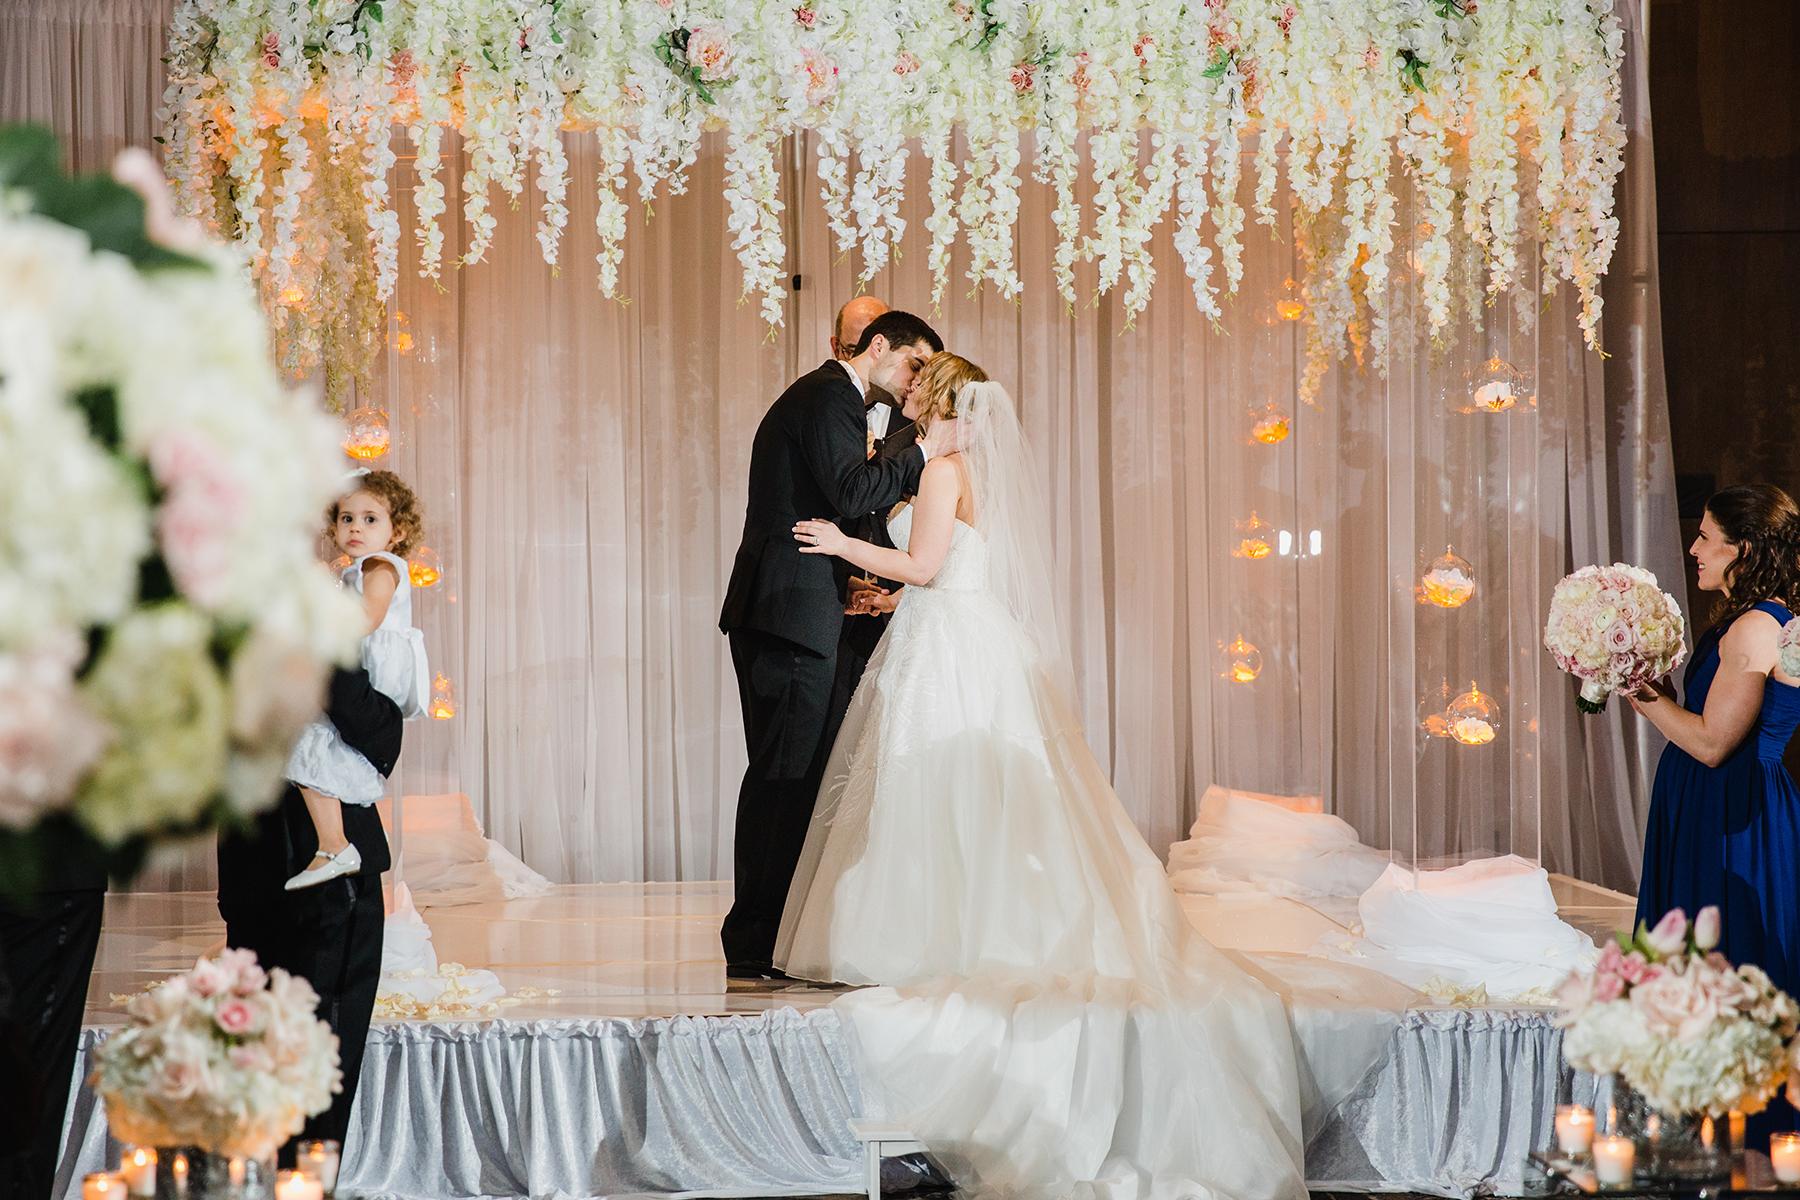 Traci_and_Ryan_Wedding-381.jpg